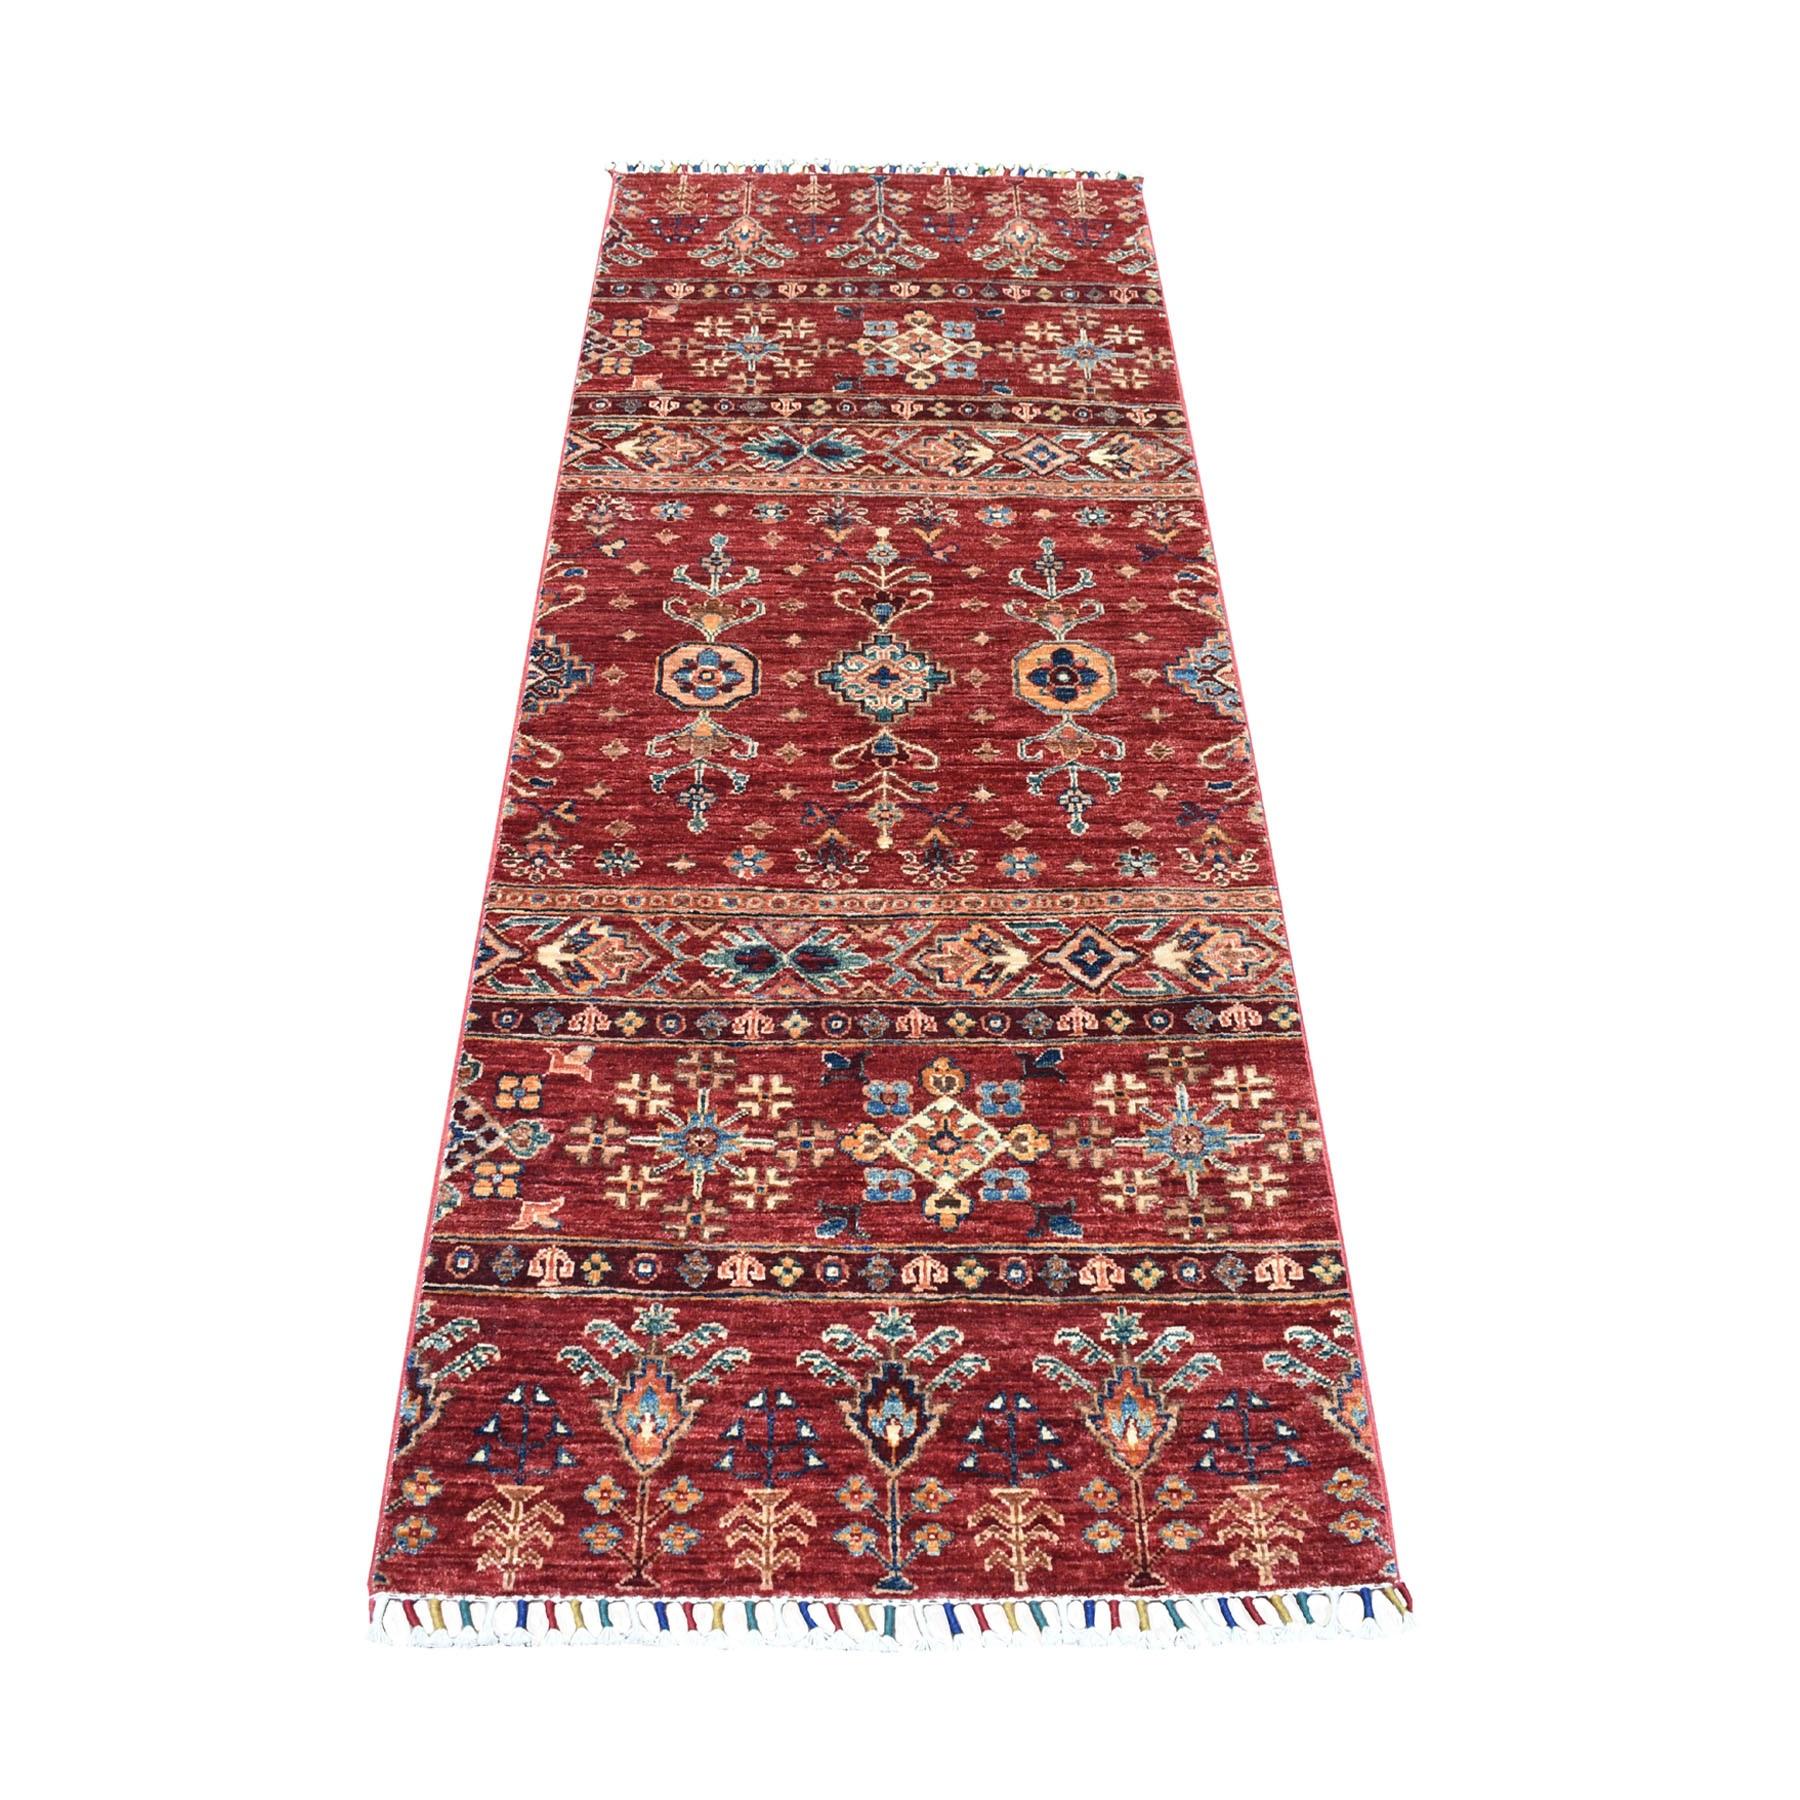 "2'7""x6'5"" Red Khorjin Design Runner Super Kazak Geometric Pure Wool Hand Knotted Oriental Rug 52896"